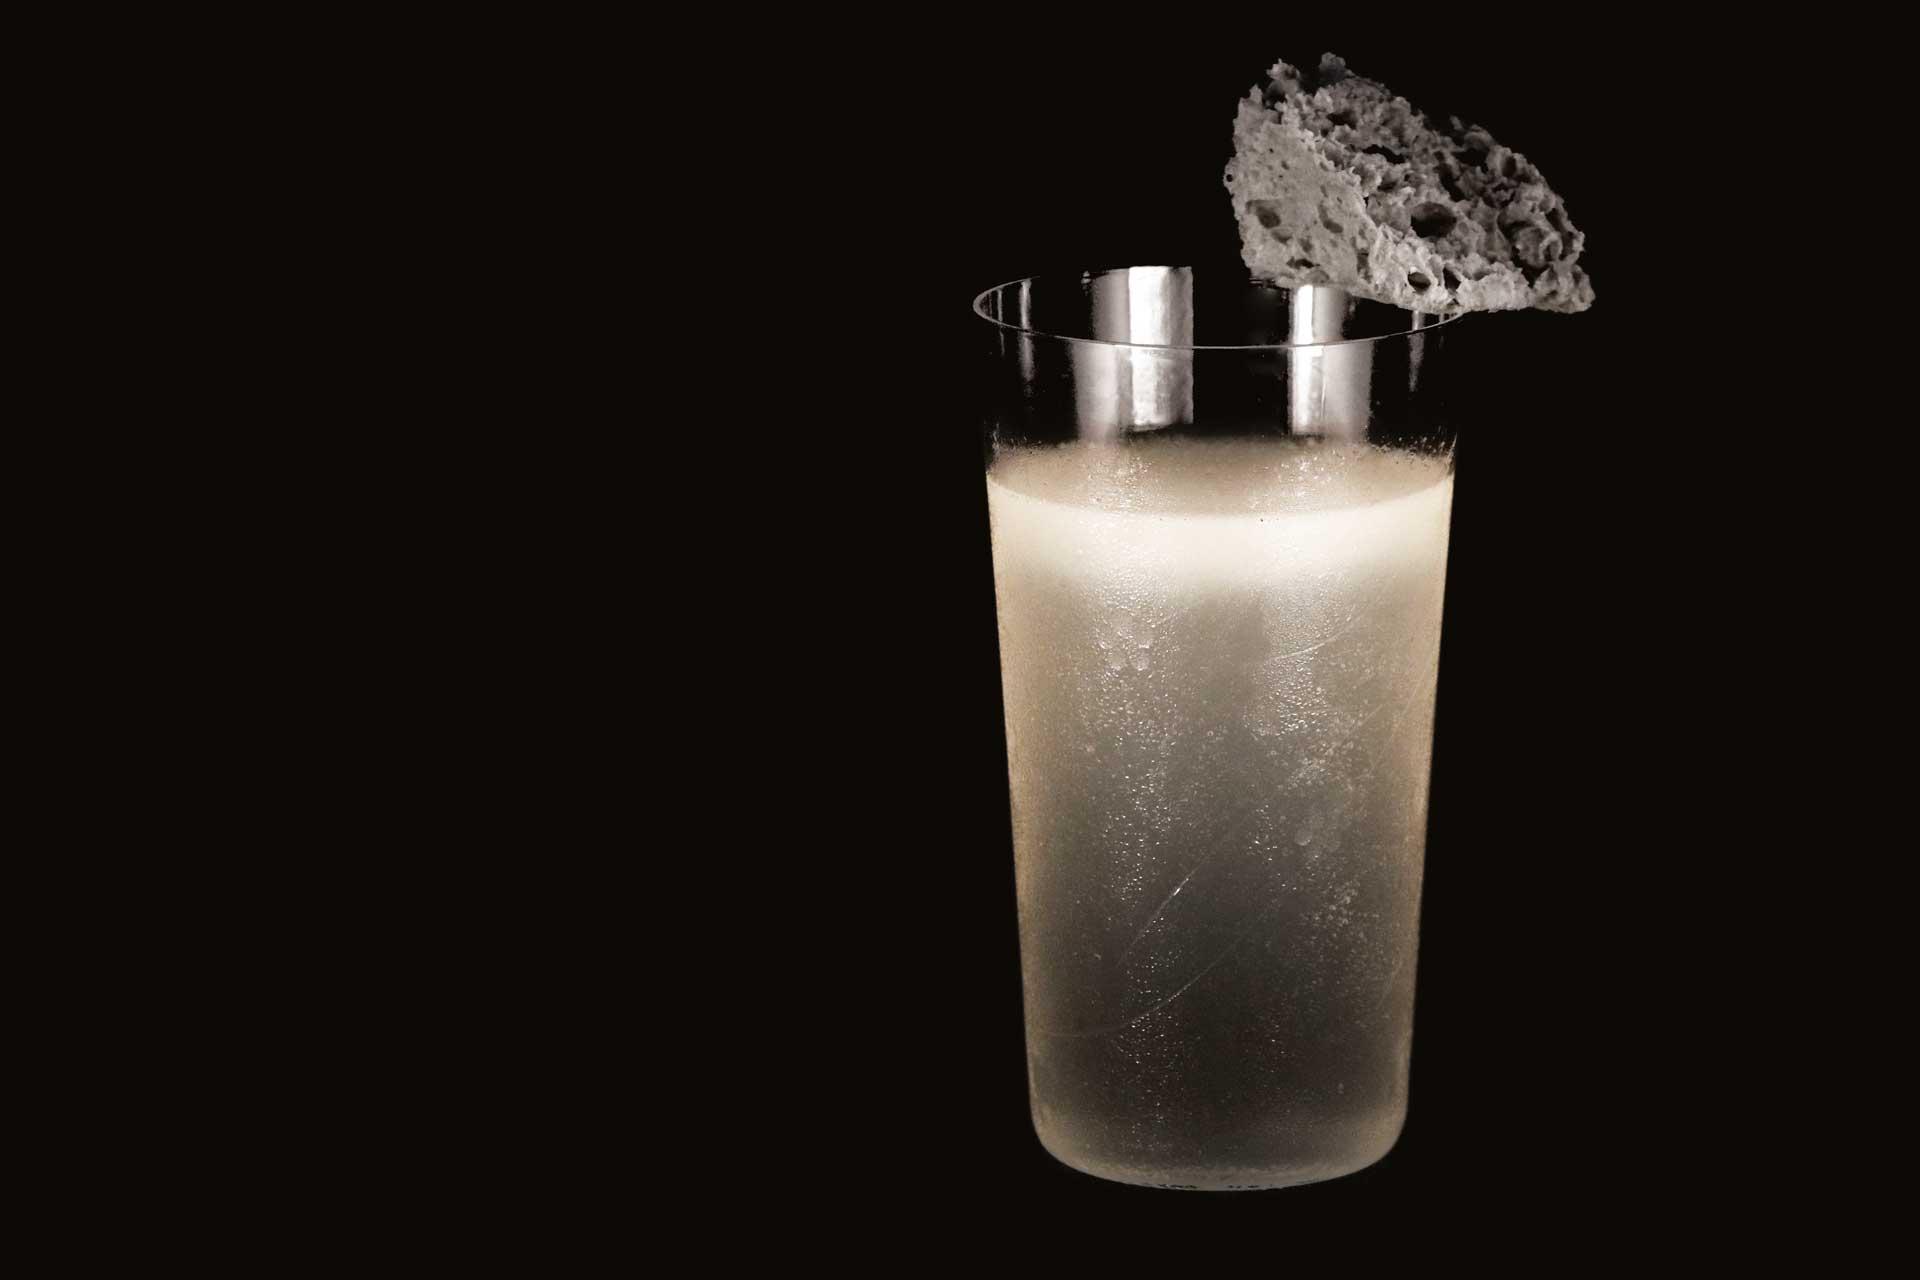 Joe Schofield's Rain cocktail featuring homemade rain spirit and an edible raincloud